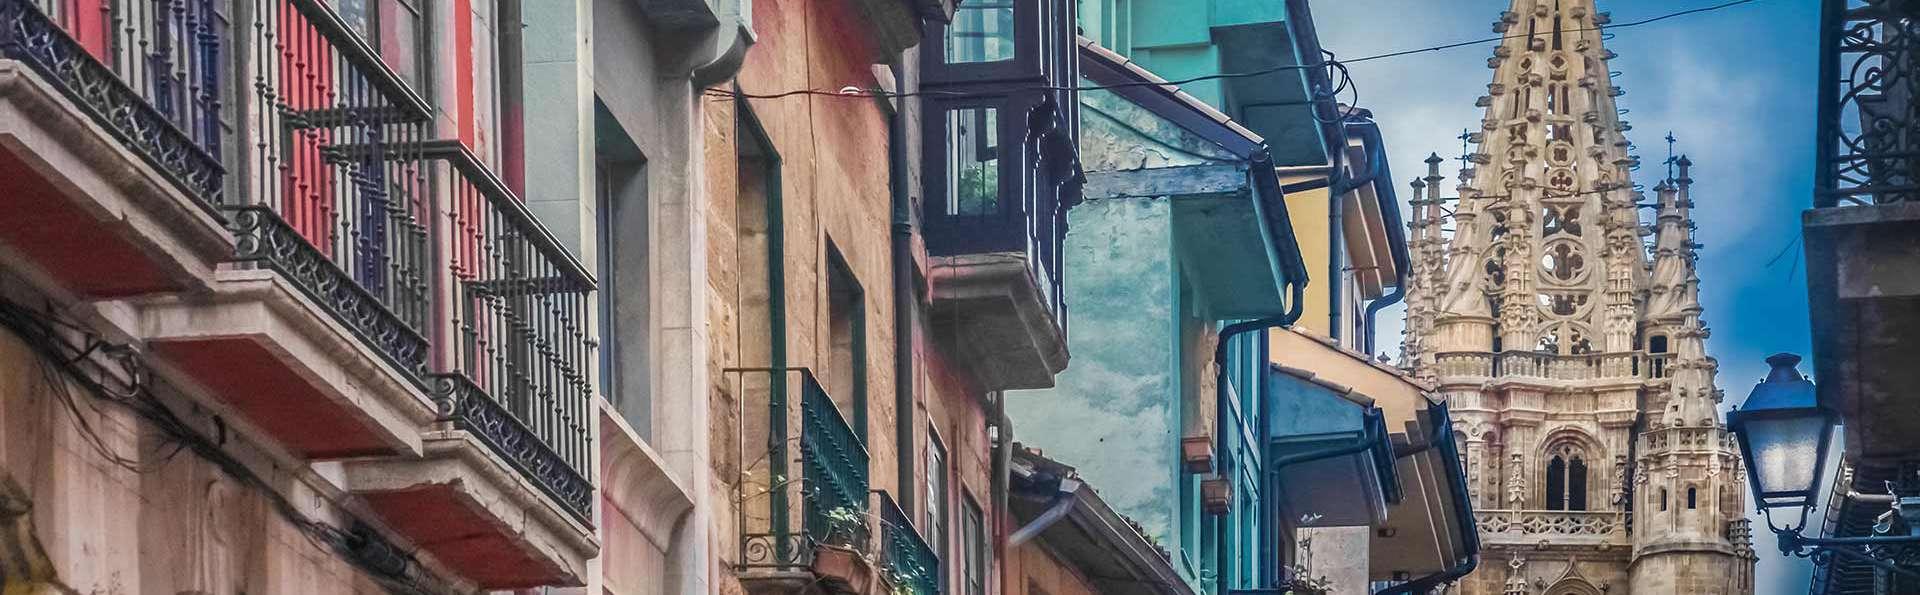 Silken Monumental Naranco - EDIT_OVIEDO2.jpg